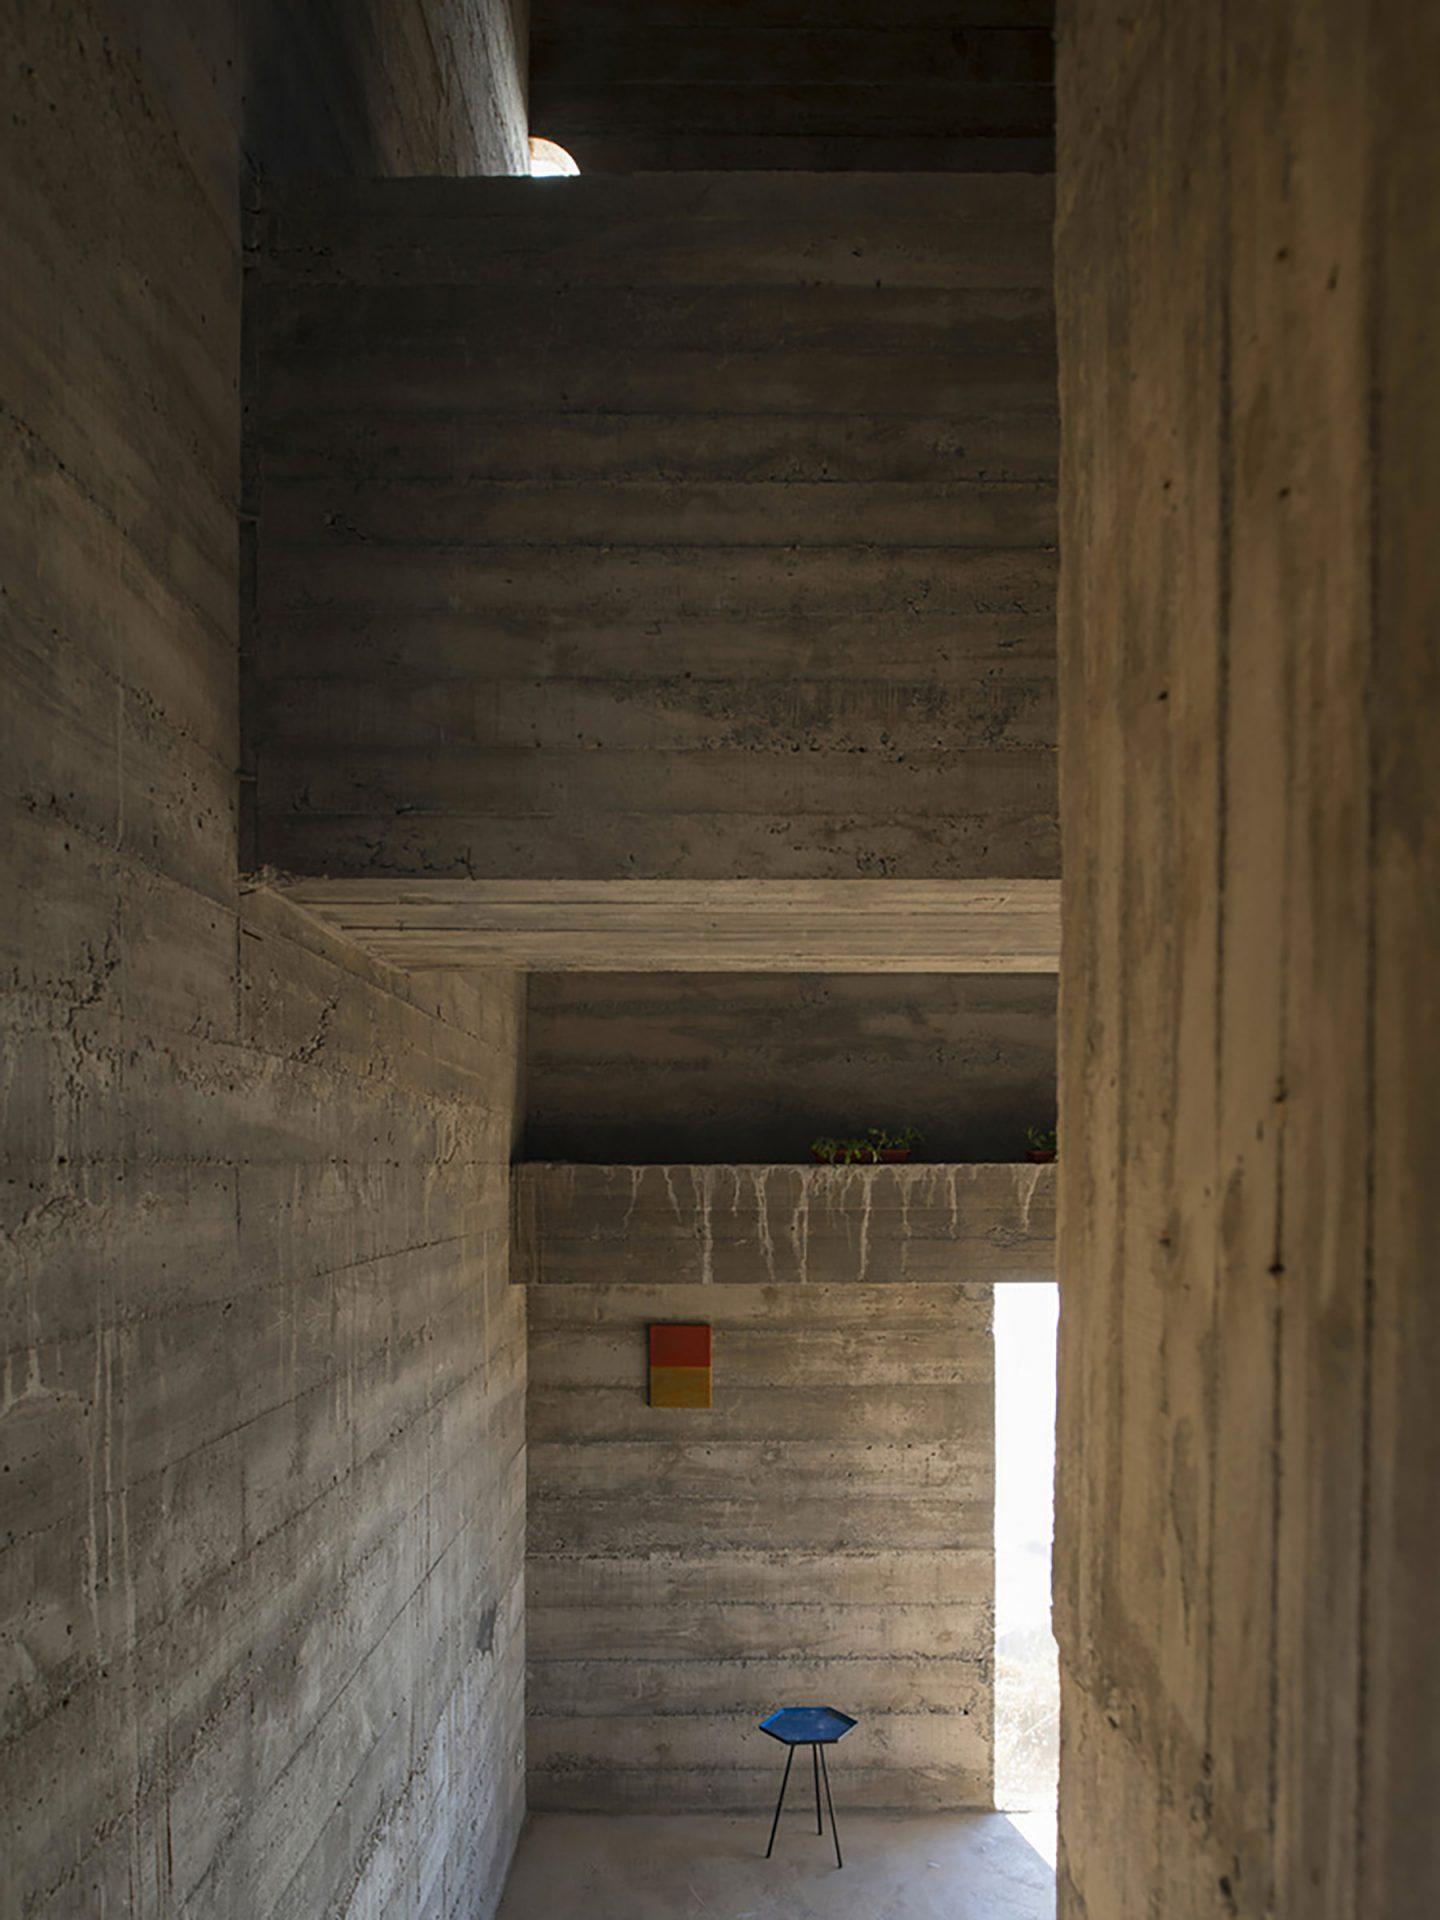 iGNANT-Architecture-Pezo-von-Ellrichshausen-Loba-House-007